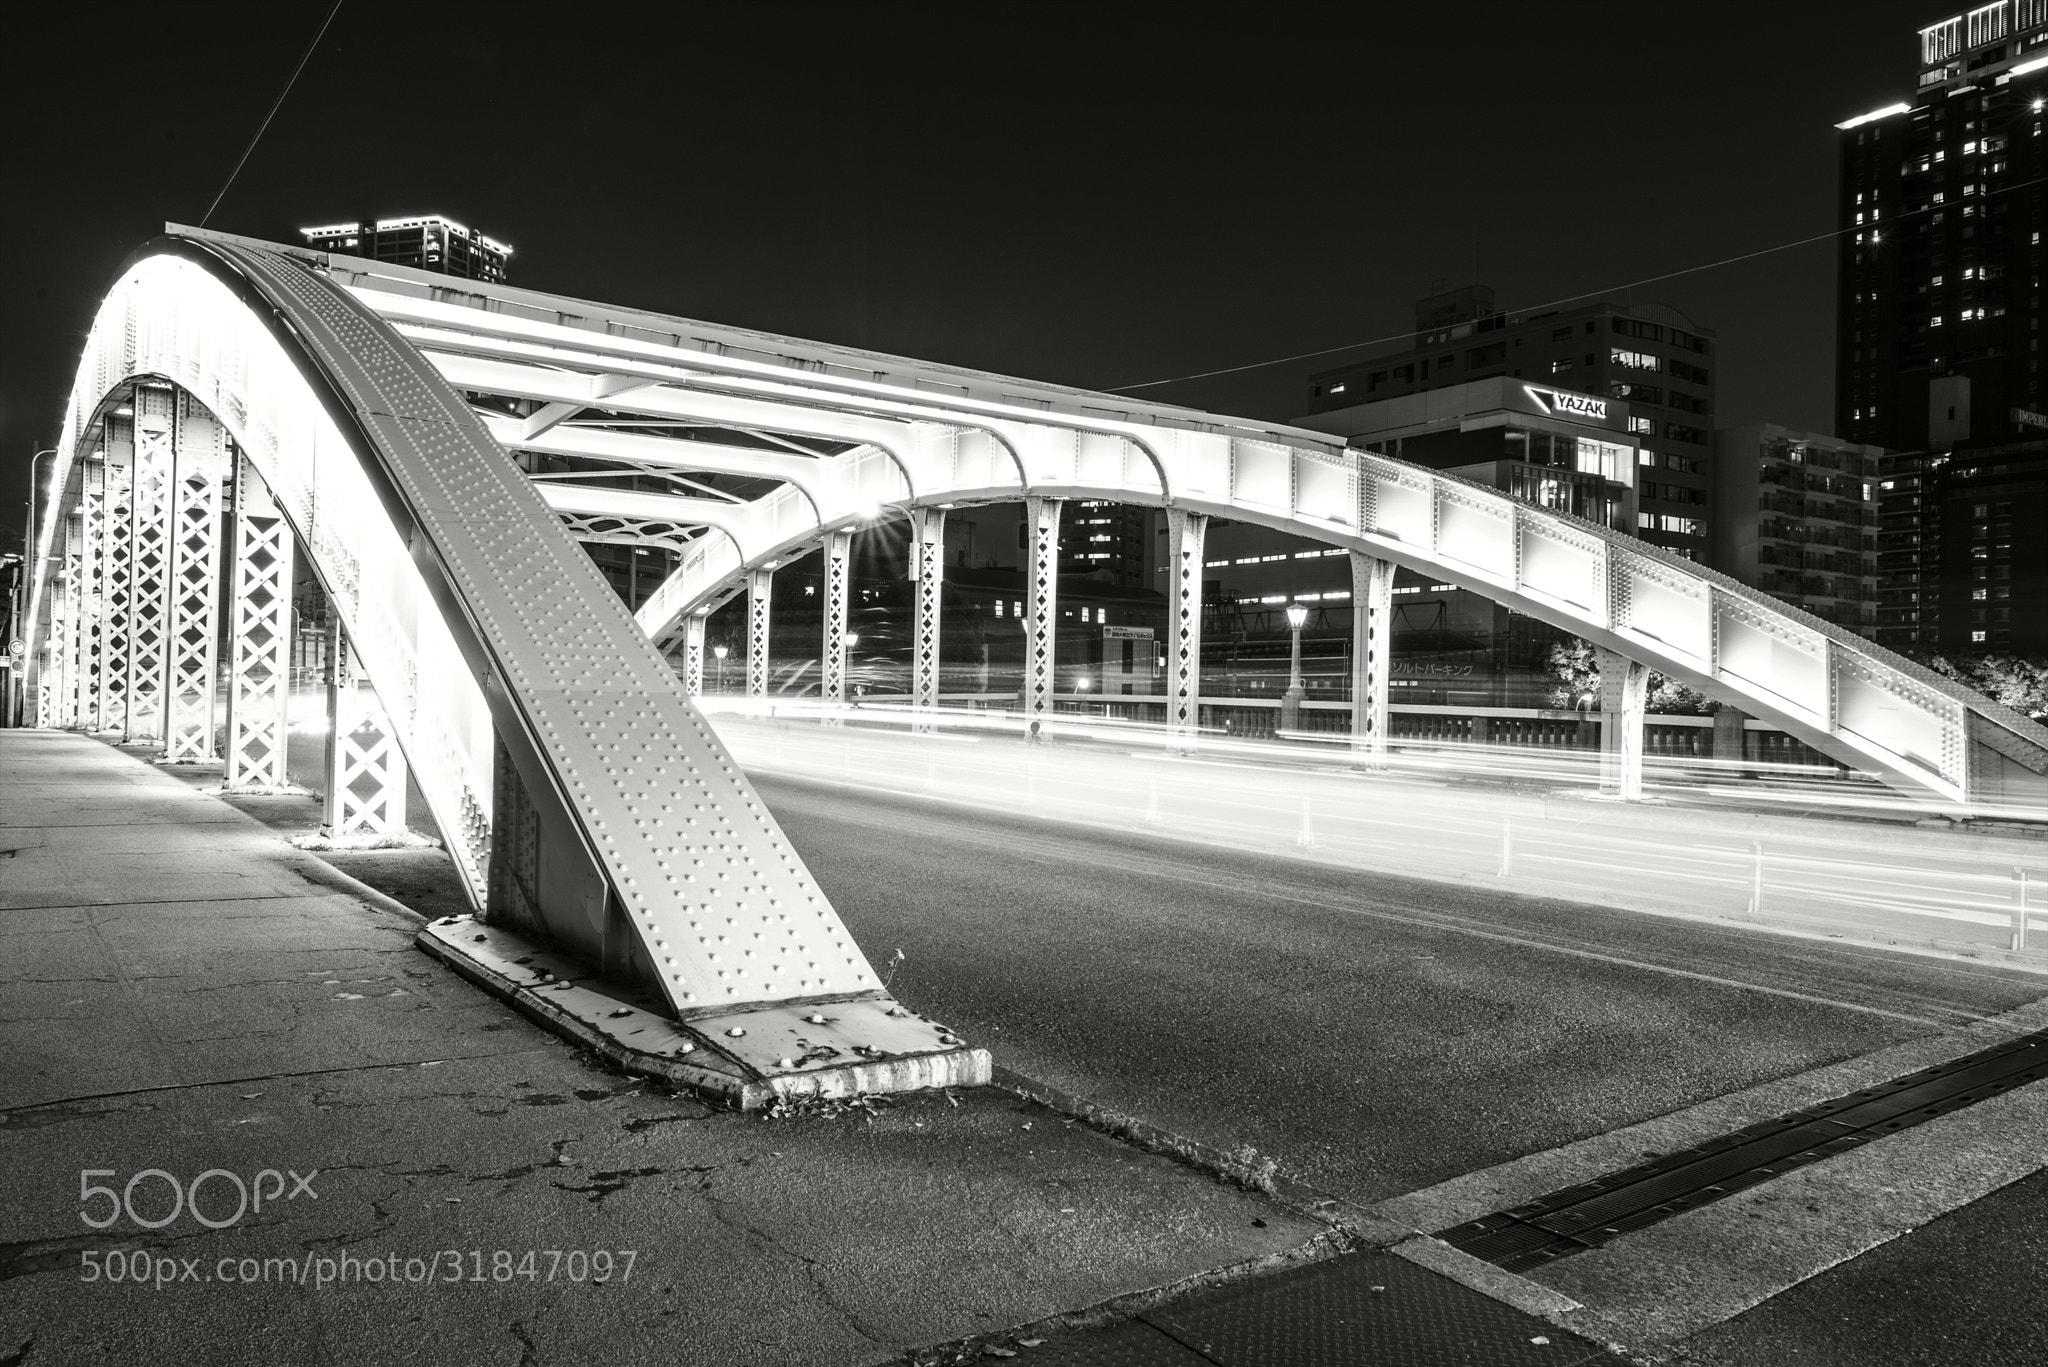 Photograph White lights bridge by hugh dornan on 500px